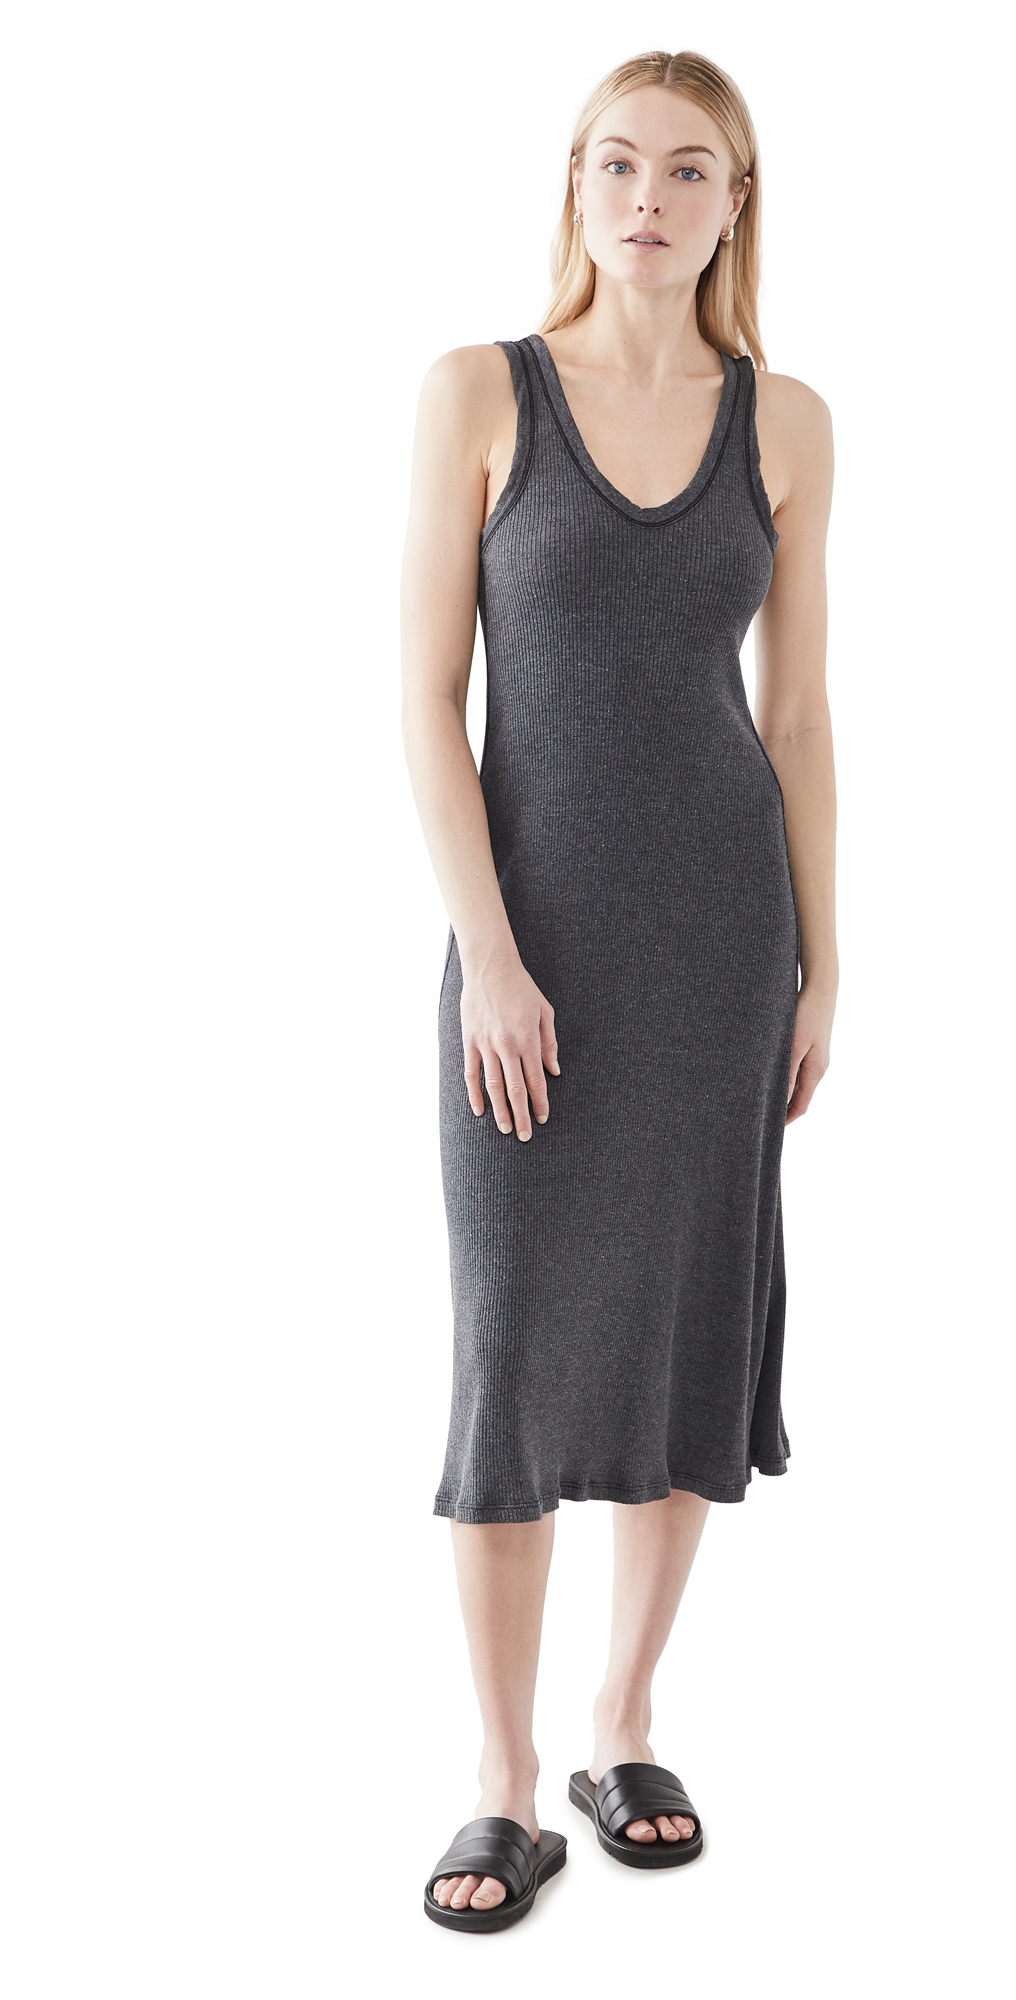 James Perse Ribbed Cami Dress